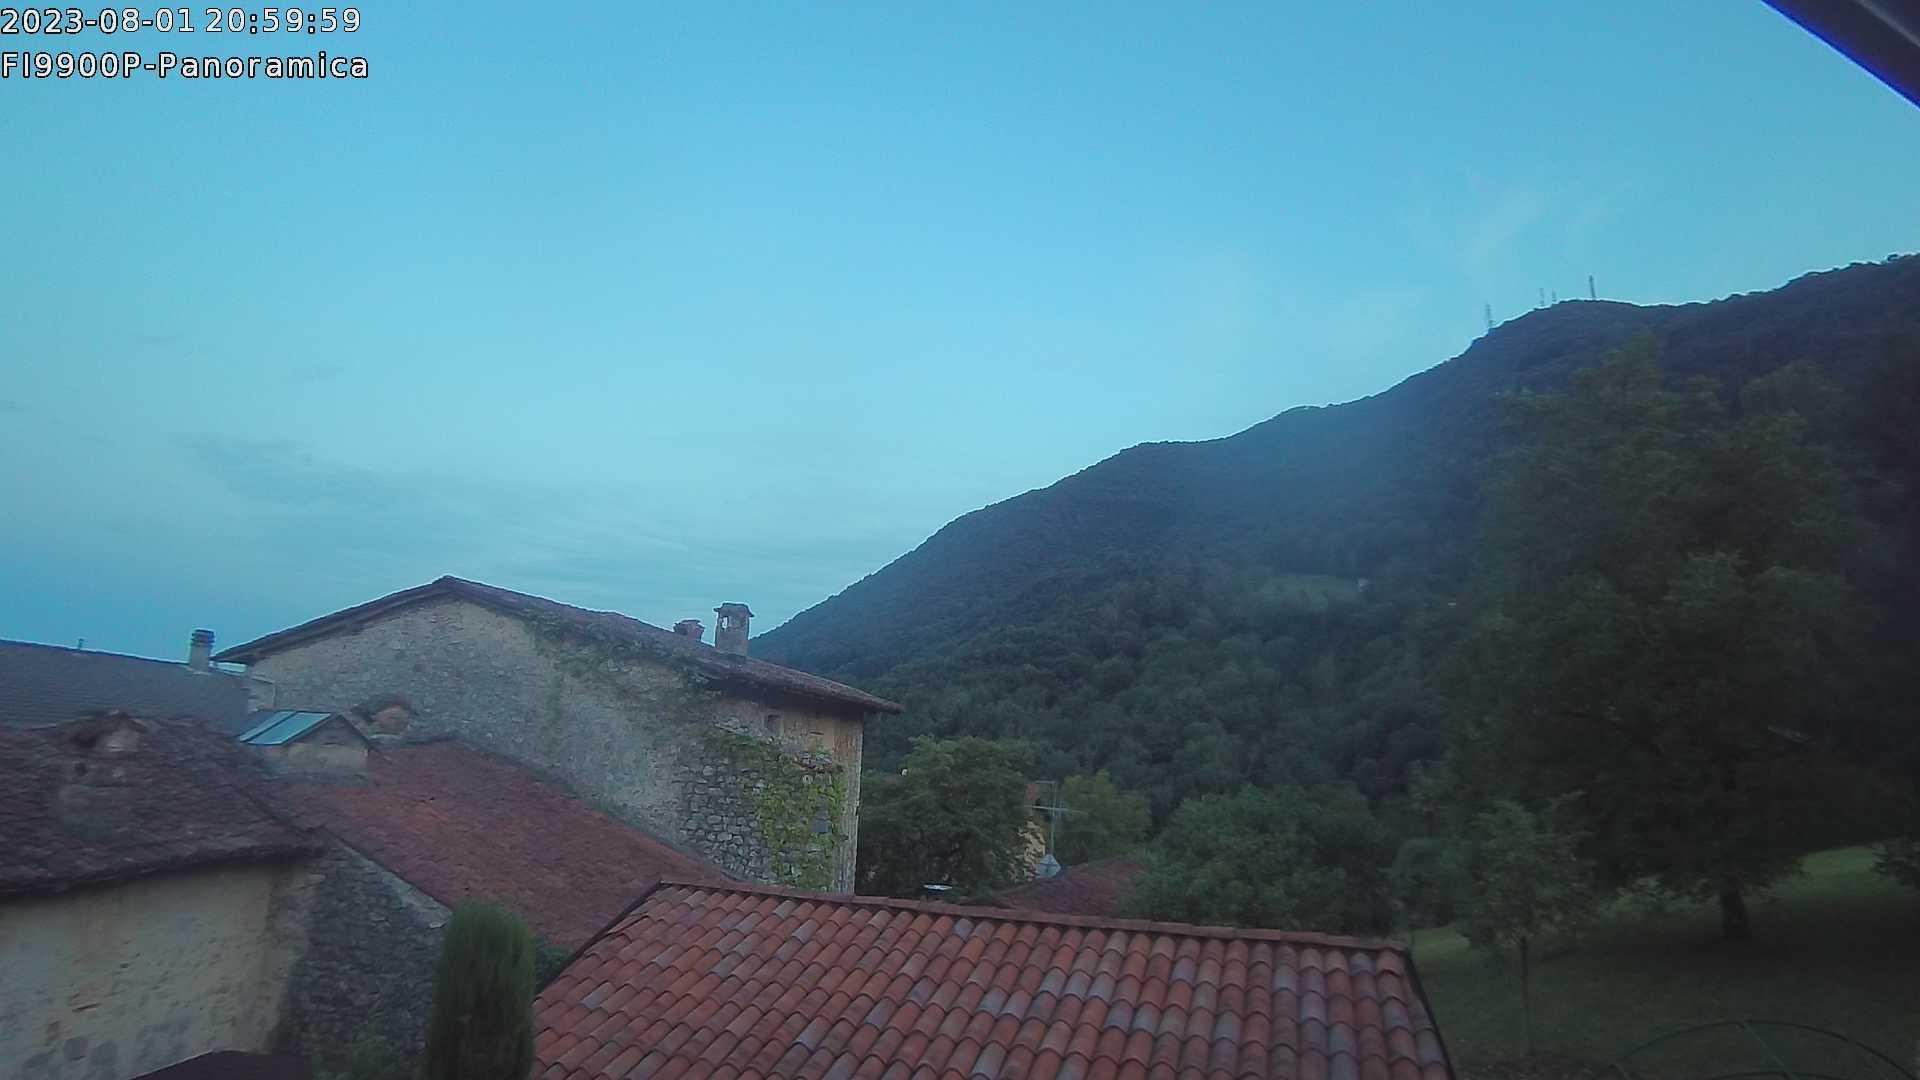 Strozza- Amagno - Valle Imagna - Vista Sud